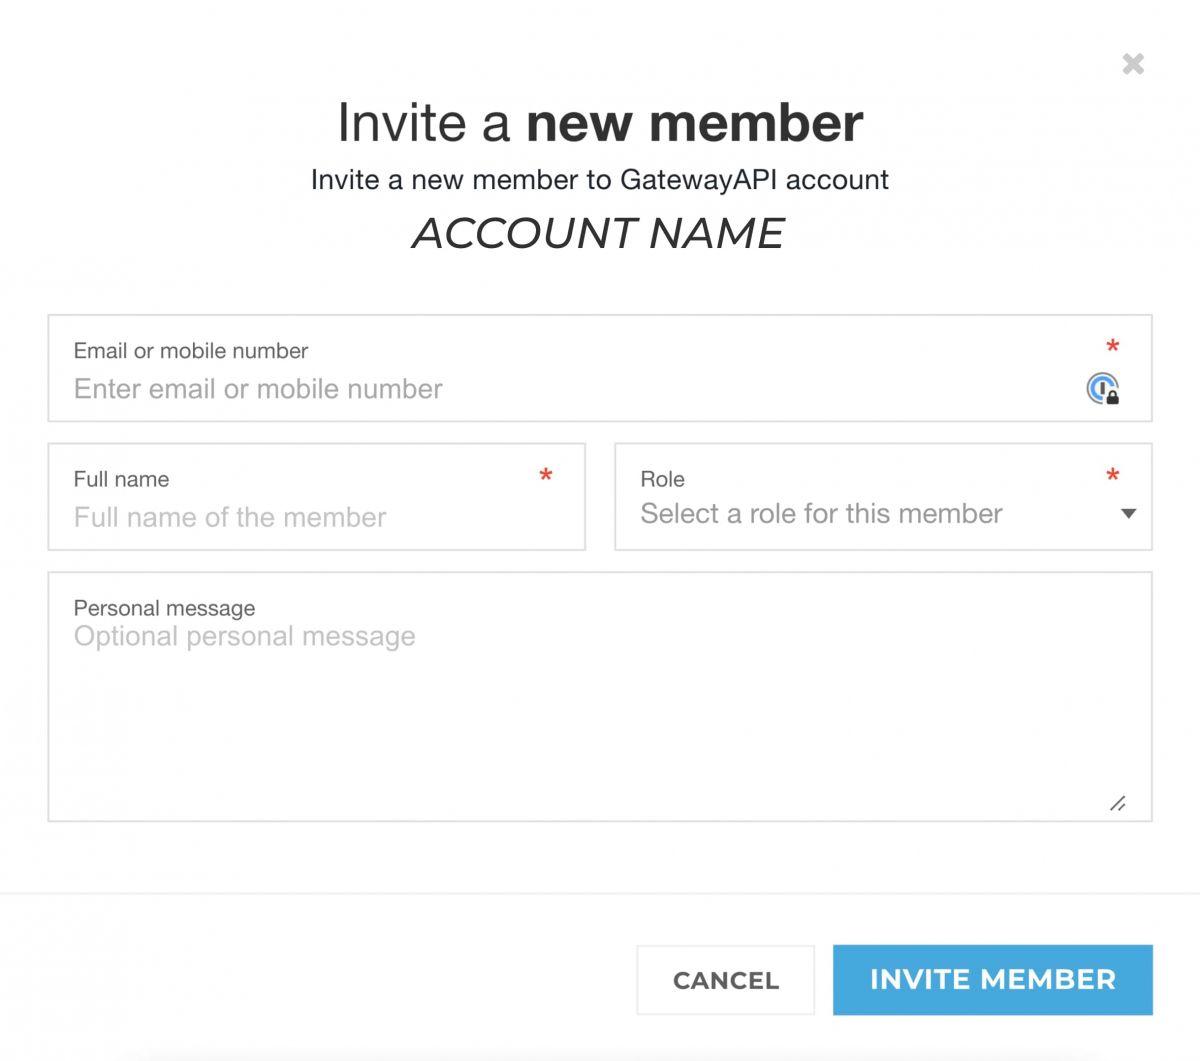 FAQ_quick_start-invite_member-step_5@2x